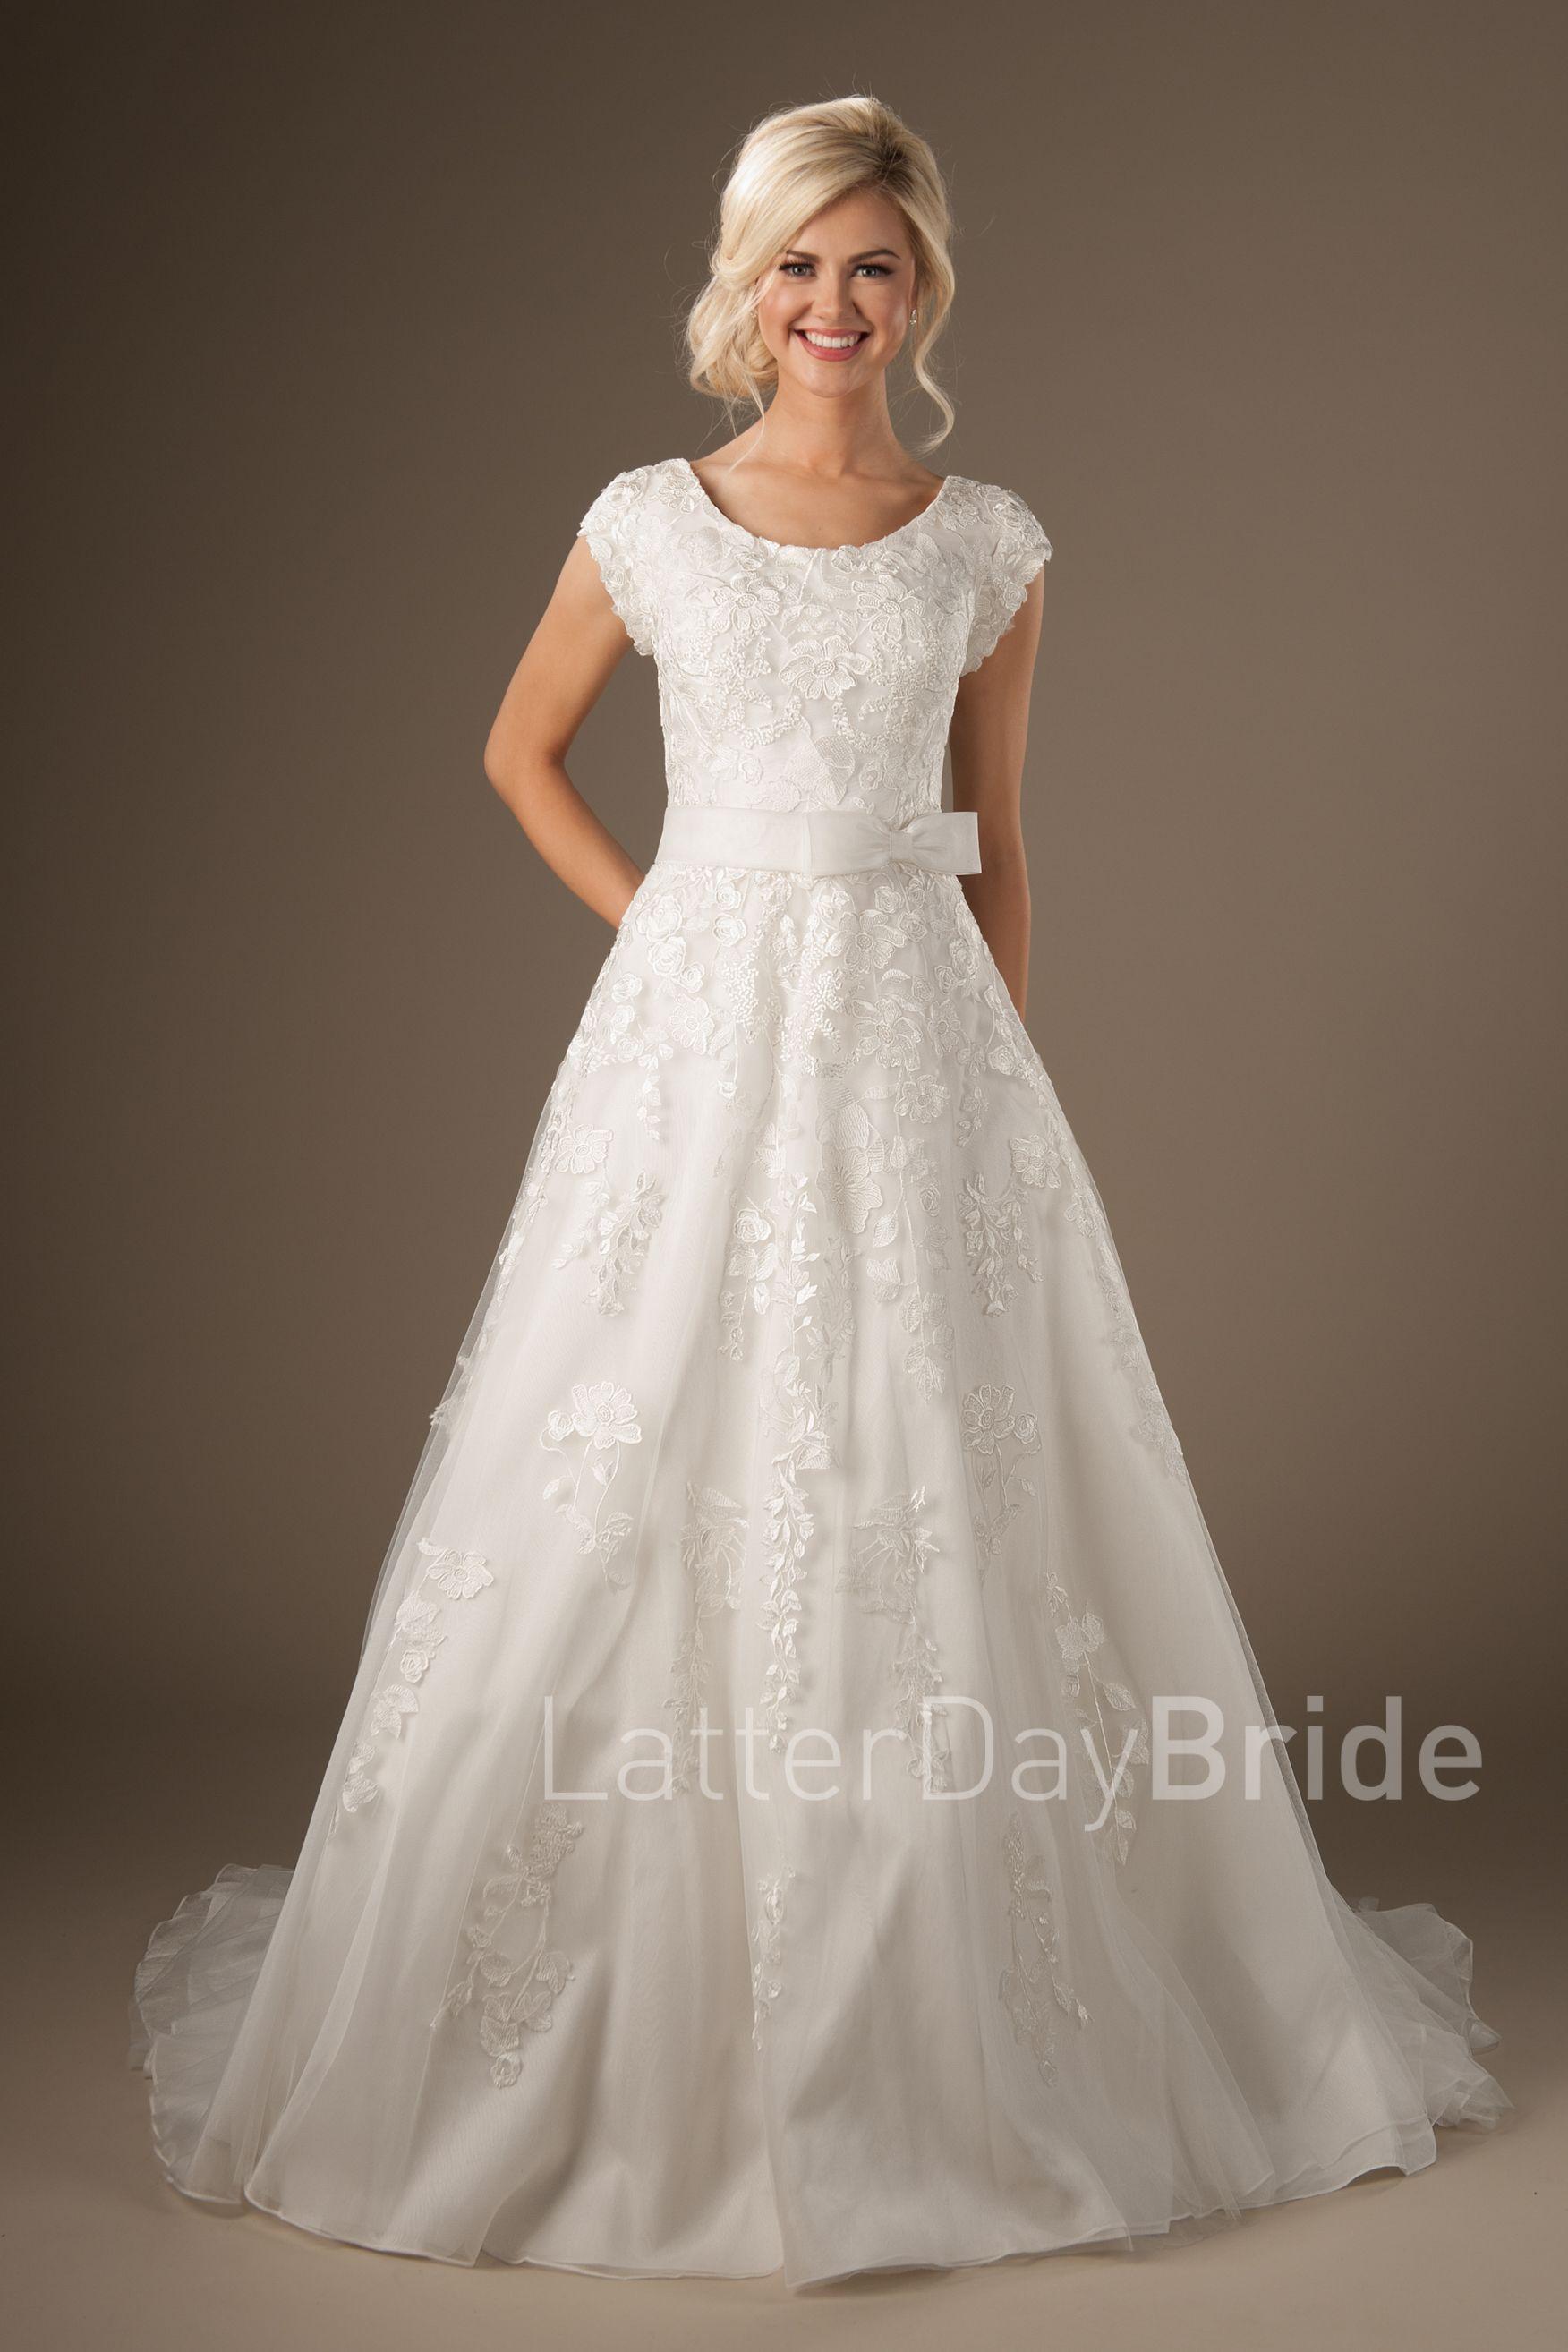 Modest LDS Wedding Dresses : Palladina | Wedding dresses | Pinterest ...